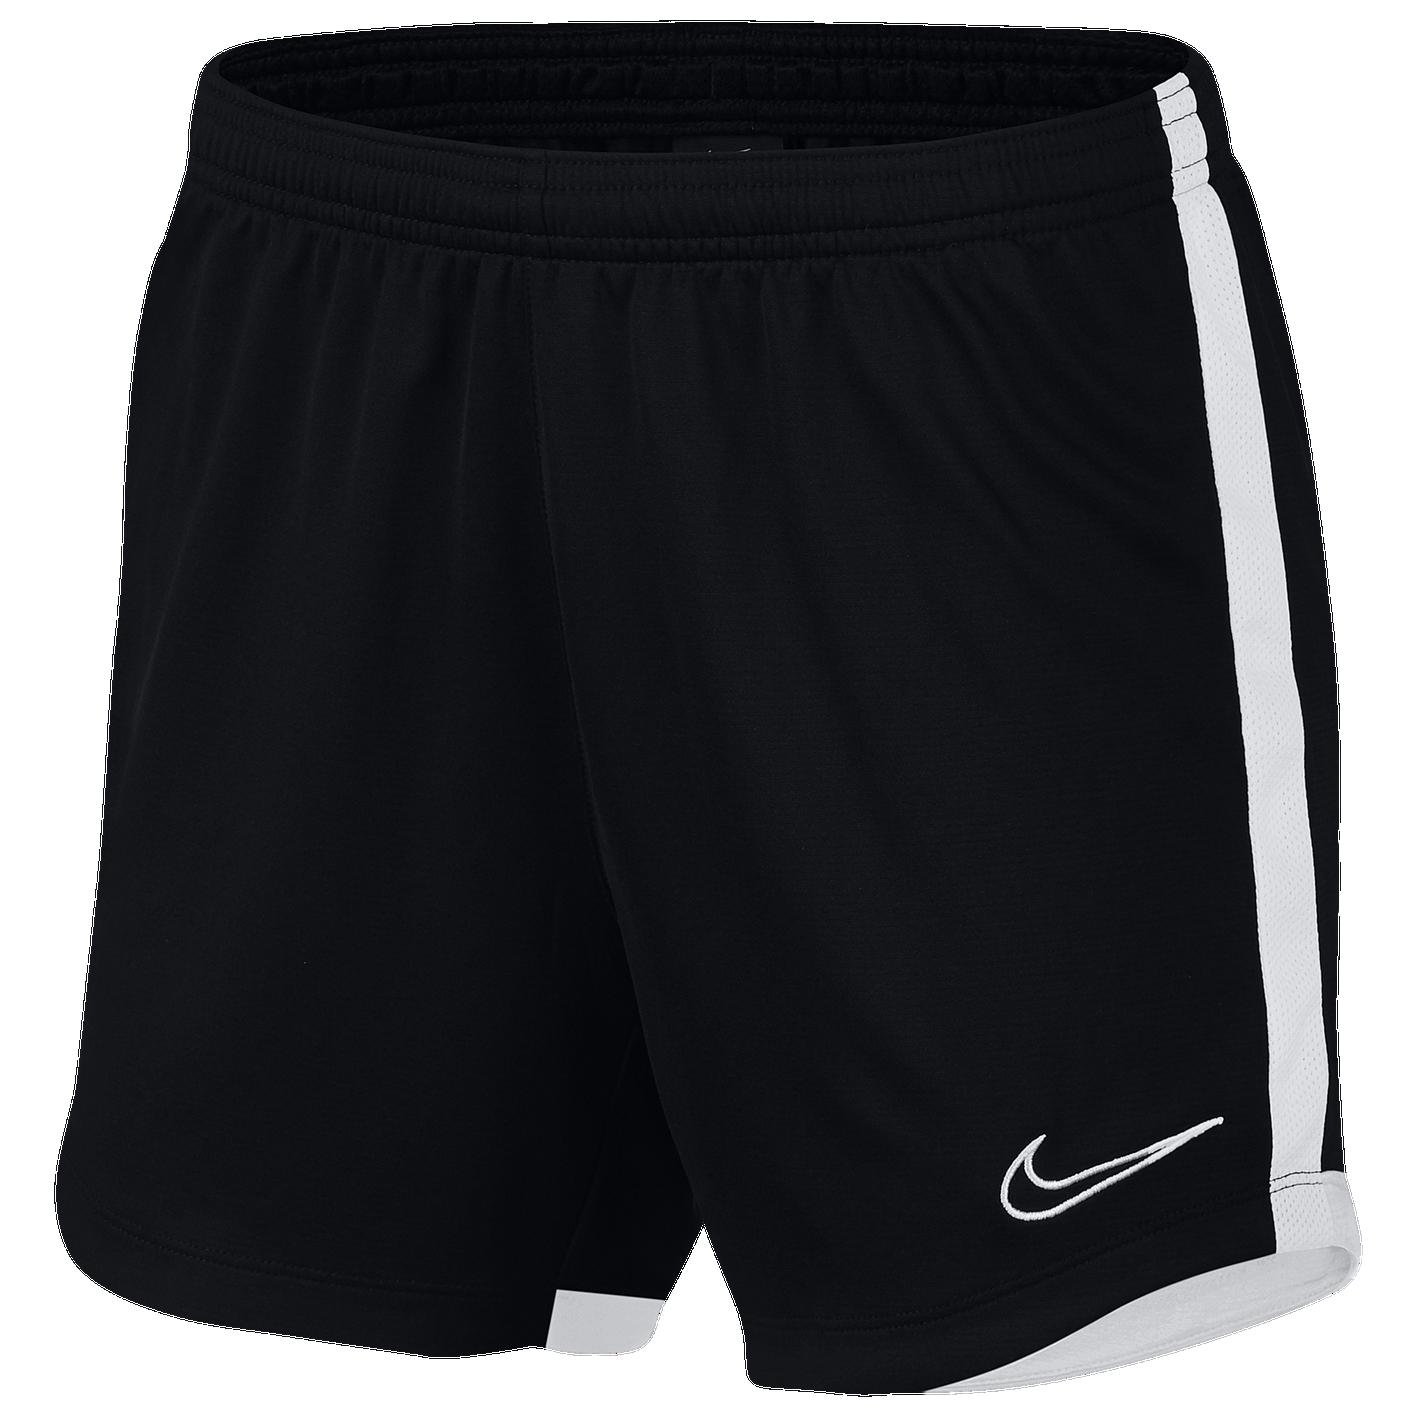 88d599df9 Nike Academy Knit Shorts - Women's - Soccer - Clothing - Black/White